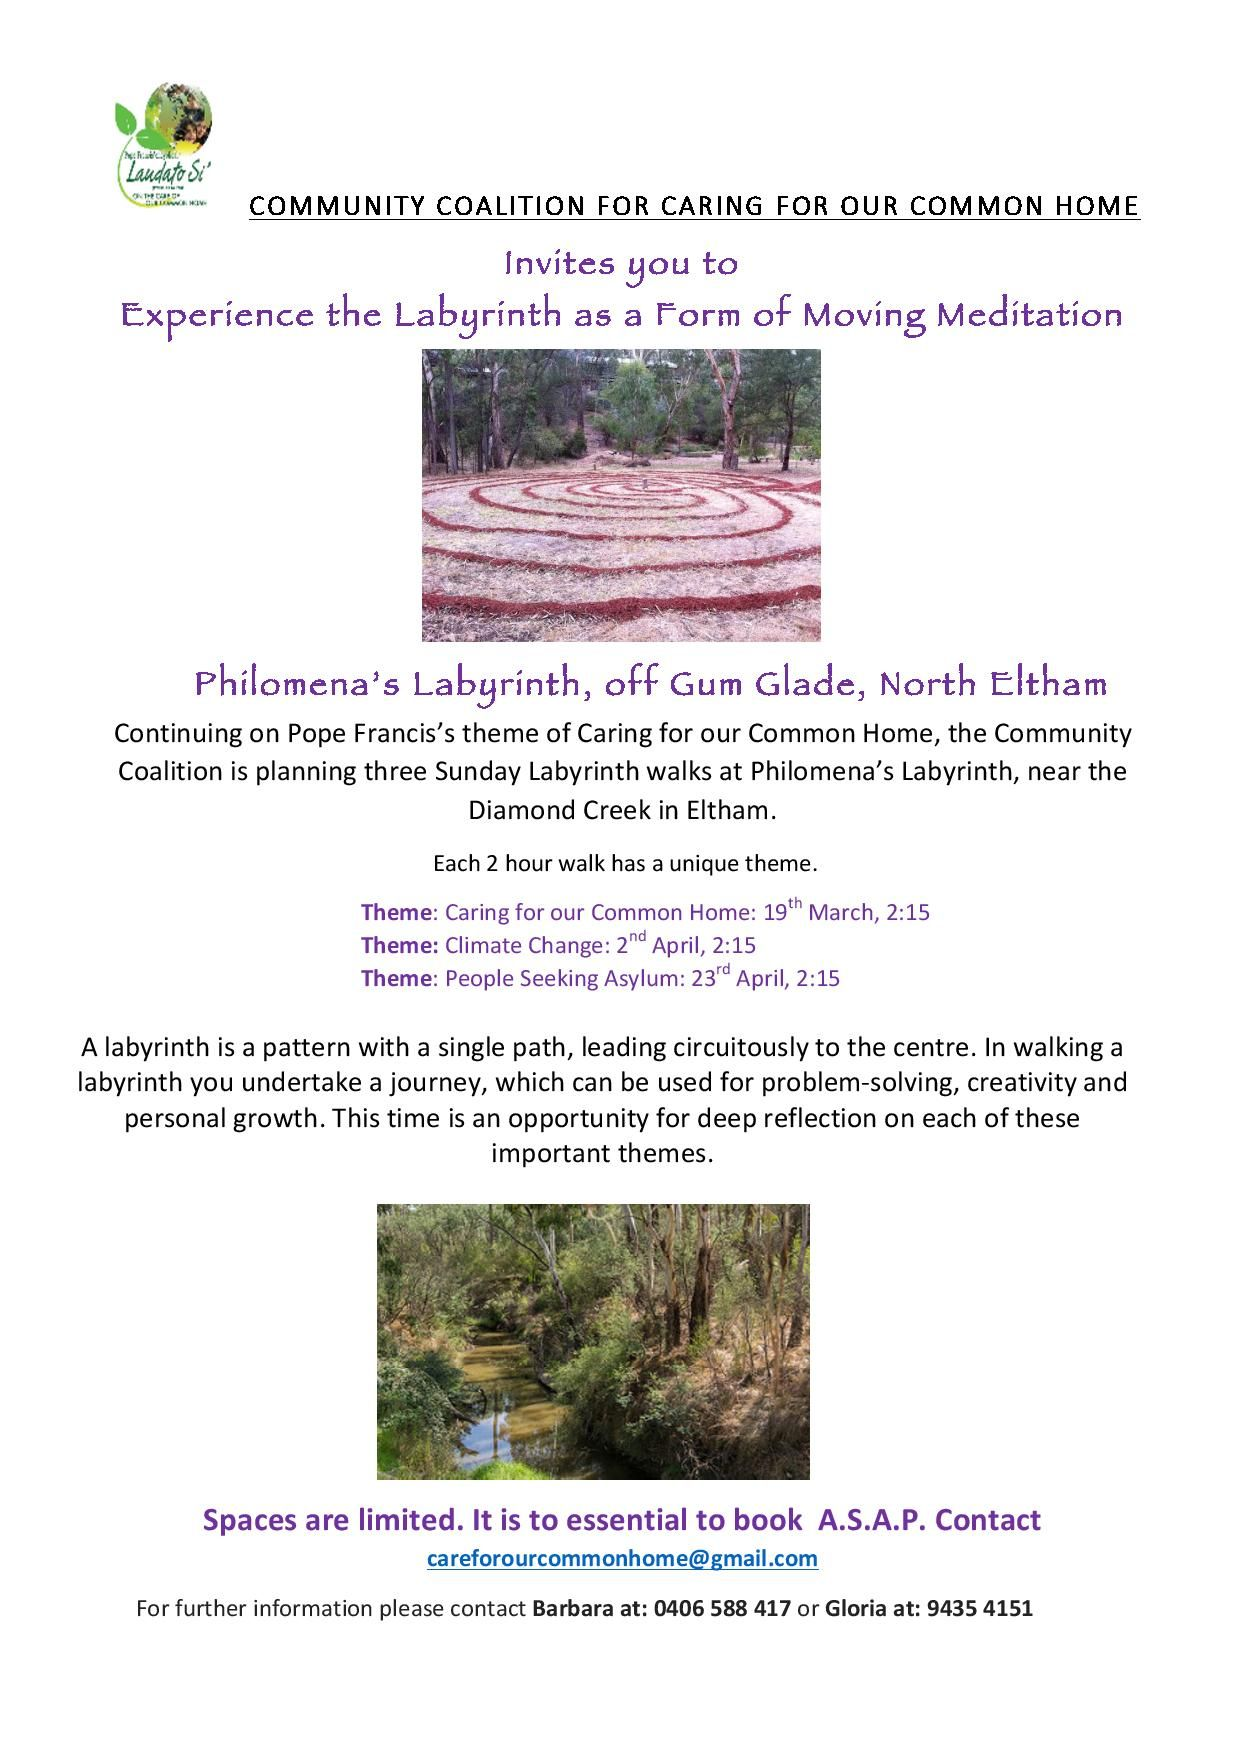 Labyrinth_Meditation_flyer-page-001.jpg